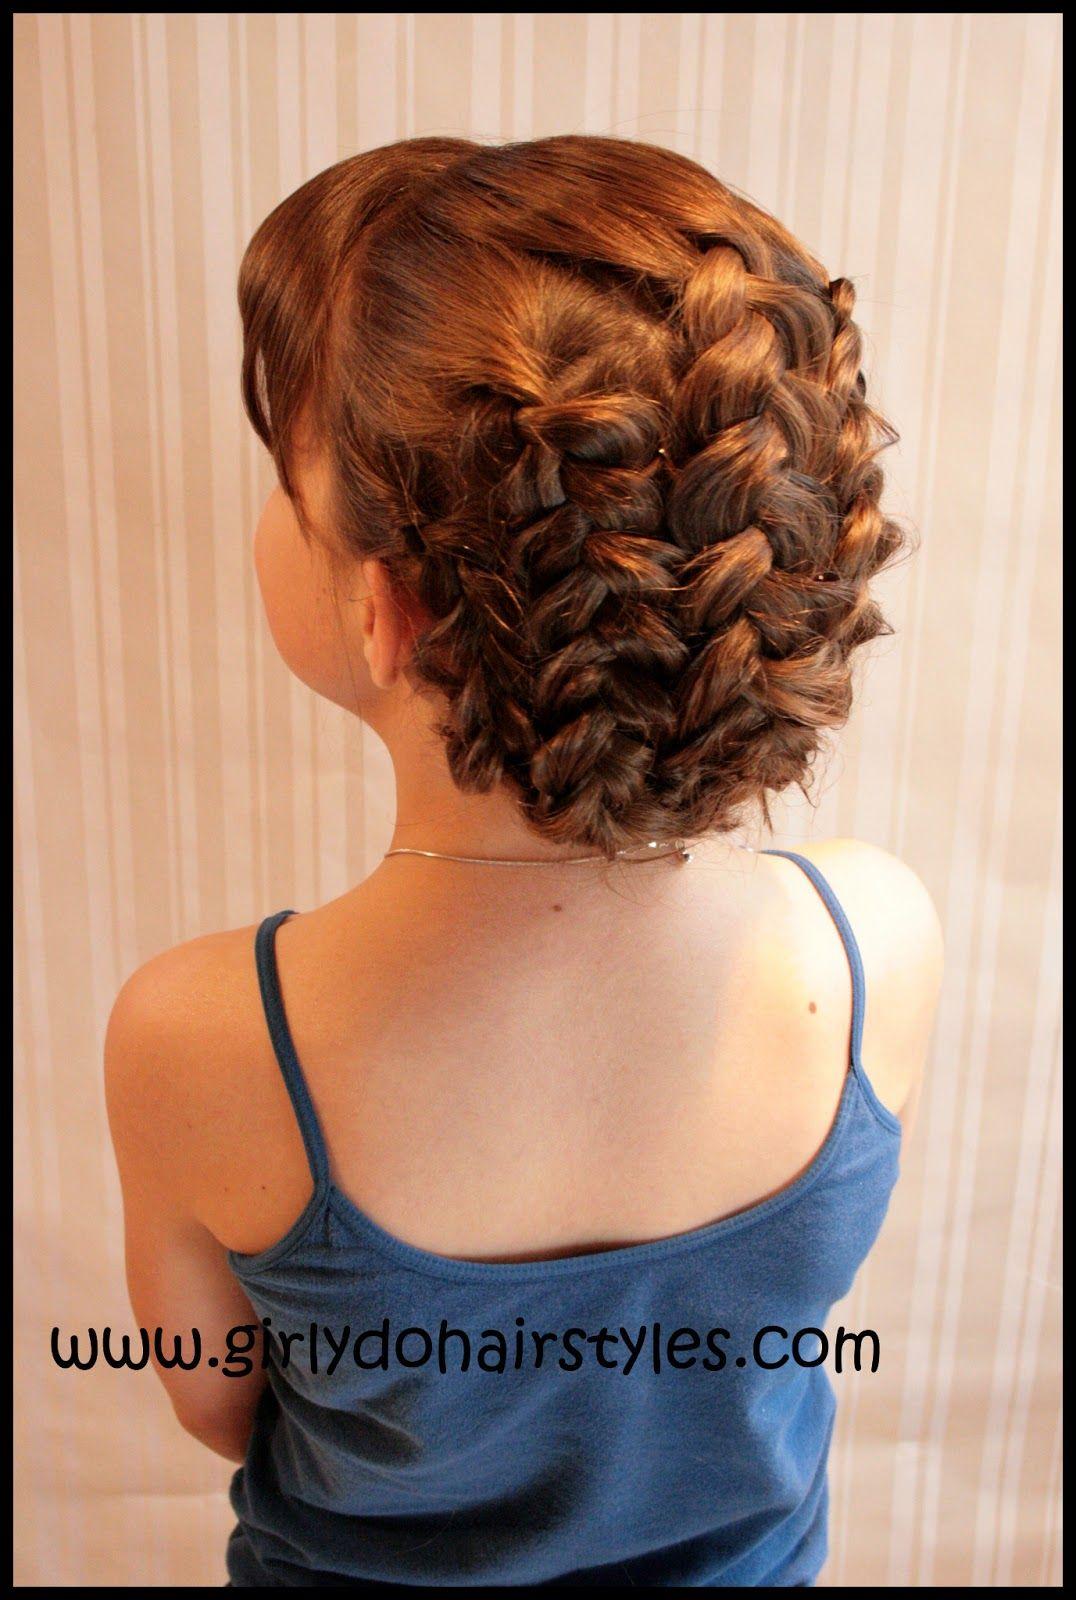 13 spring hairstyles | hair styling | hair styles, hair